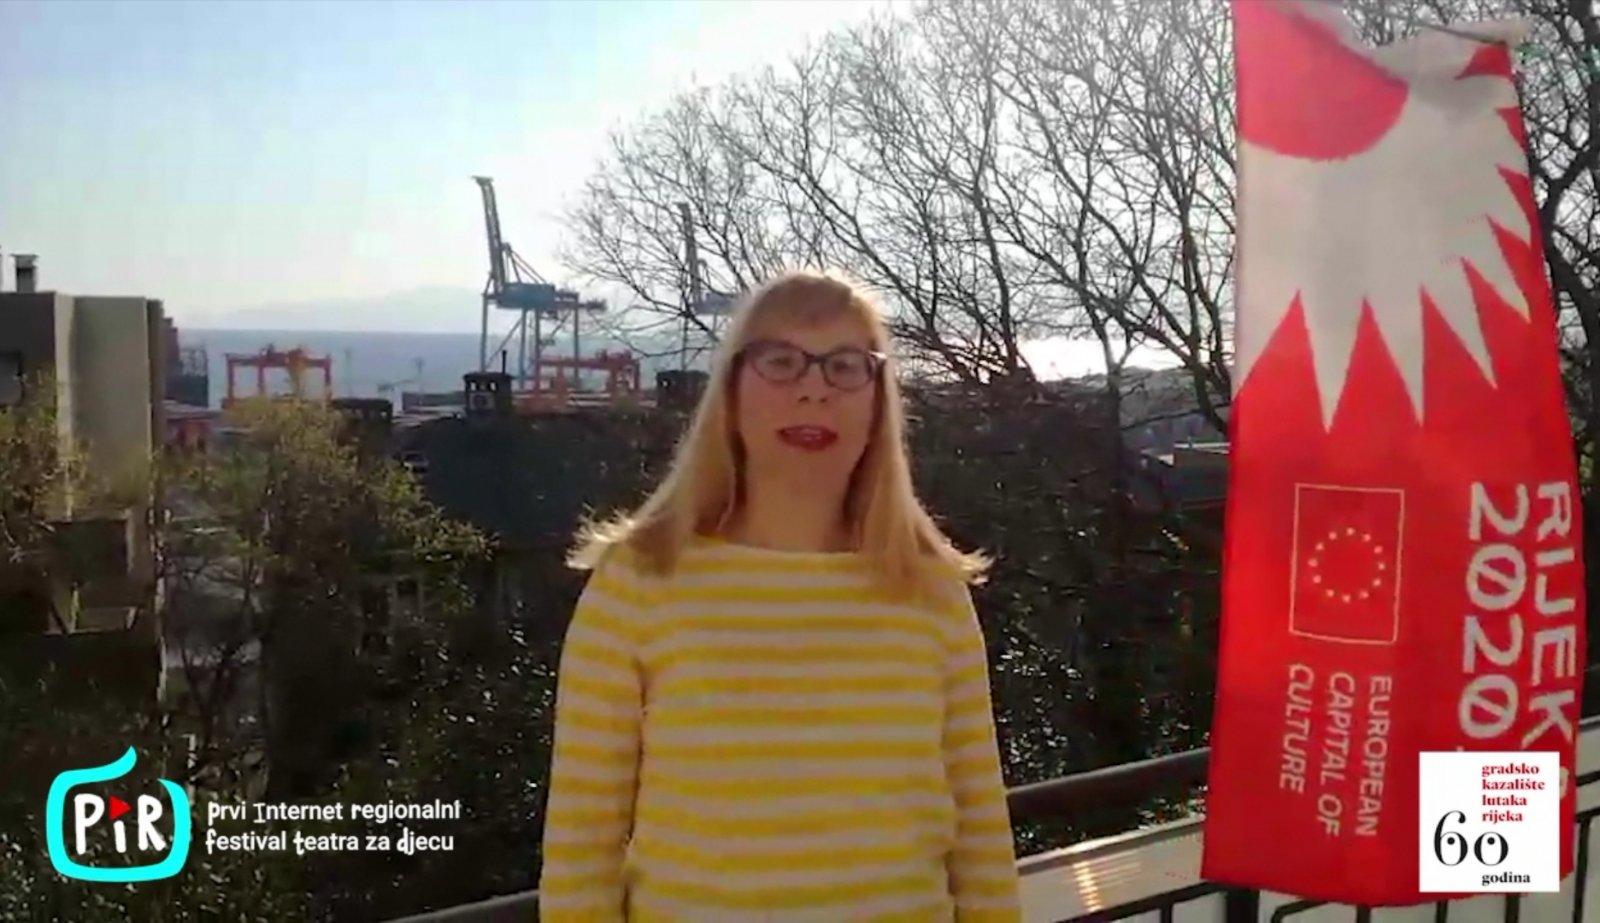 PIR FESTIVAL: Magdalena Lupi Alvir